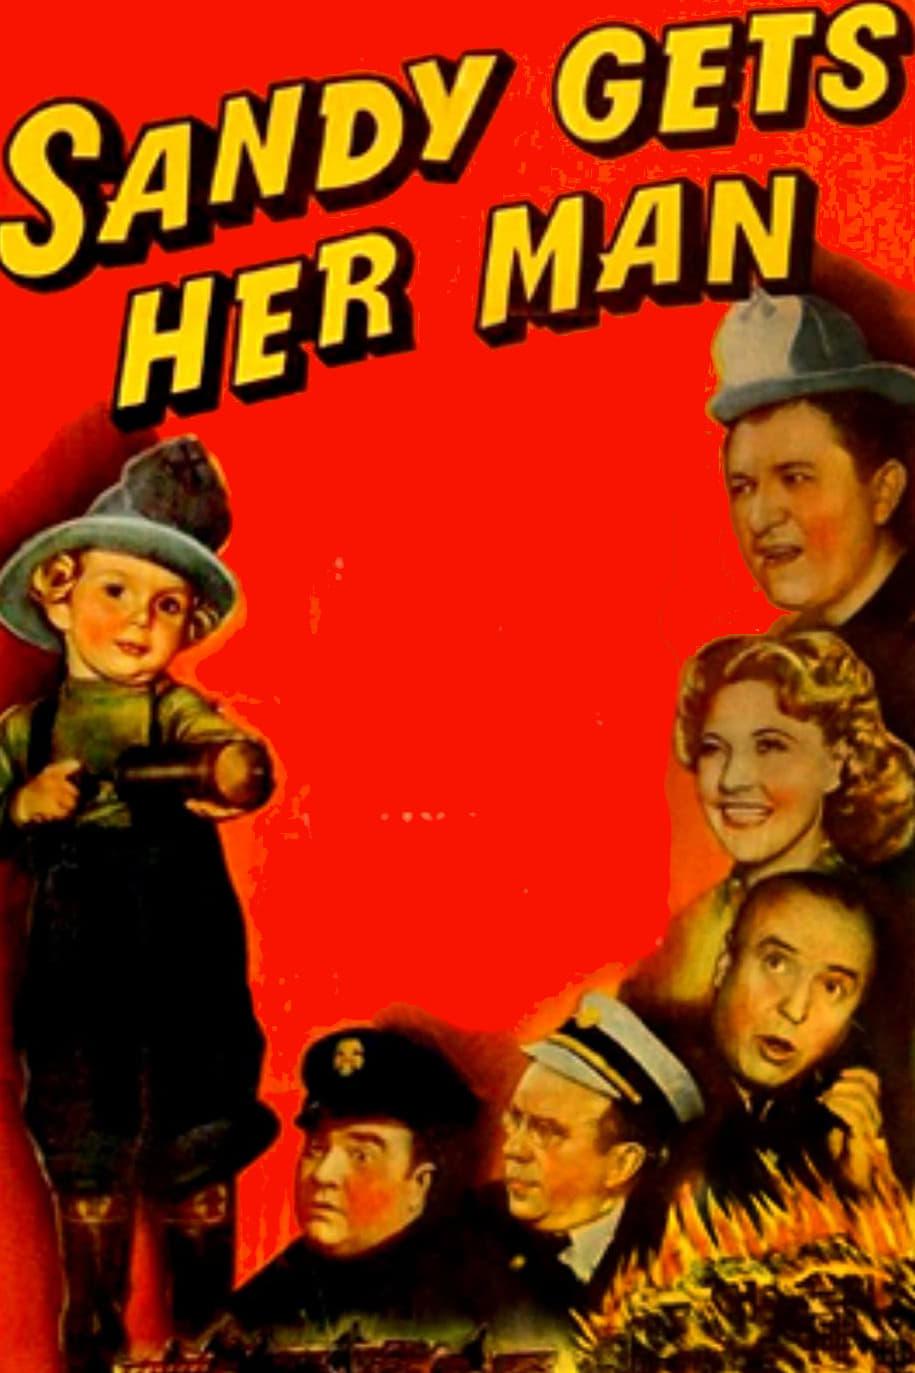 Sandy Gets Her Man